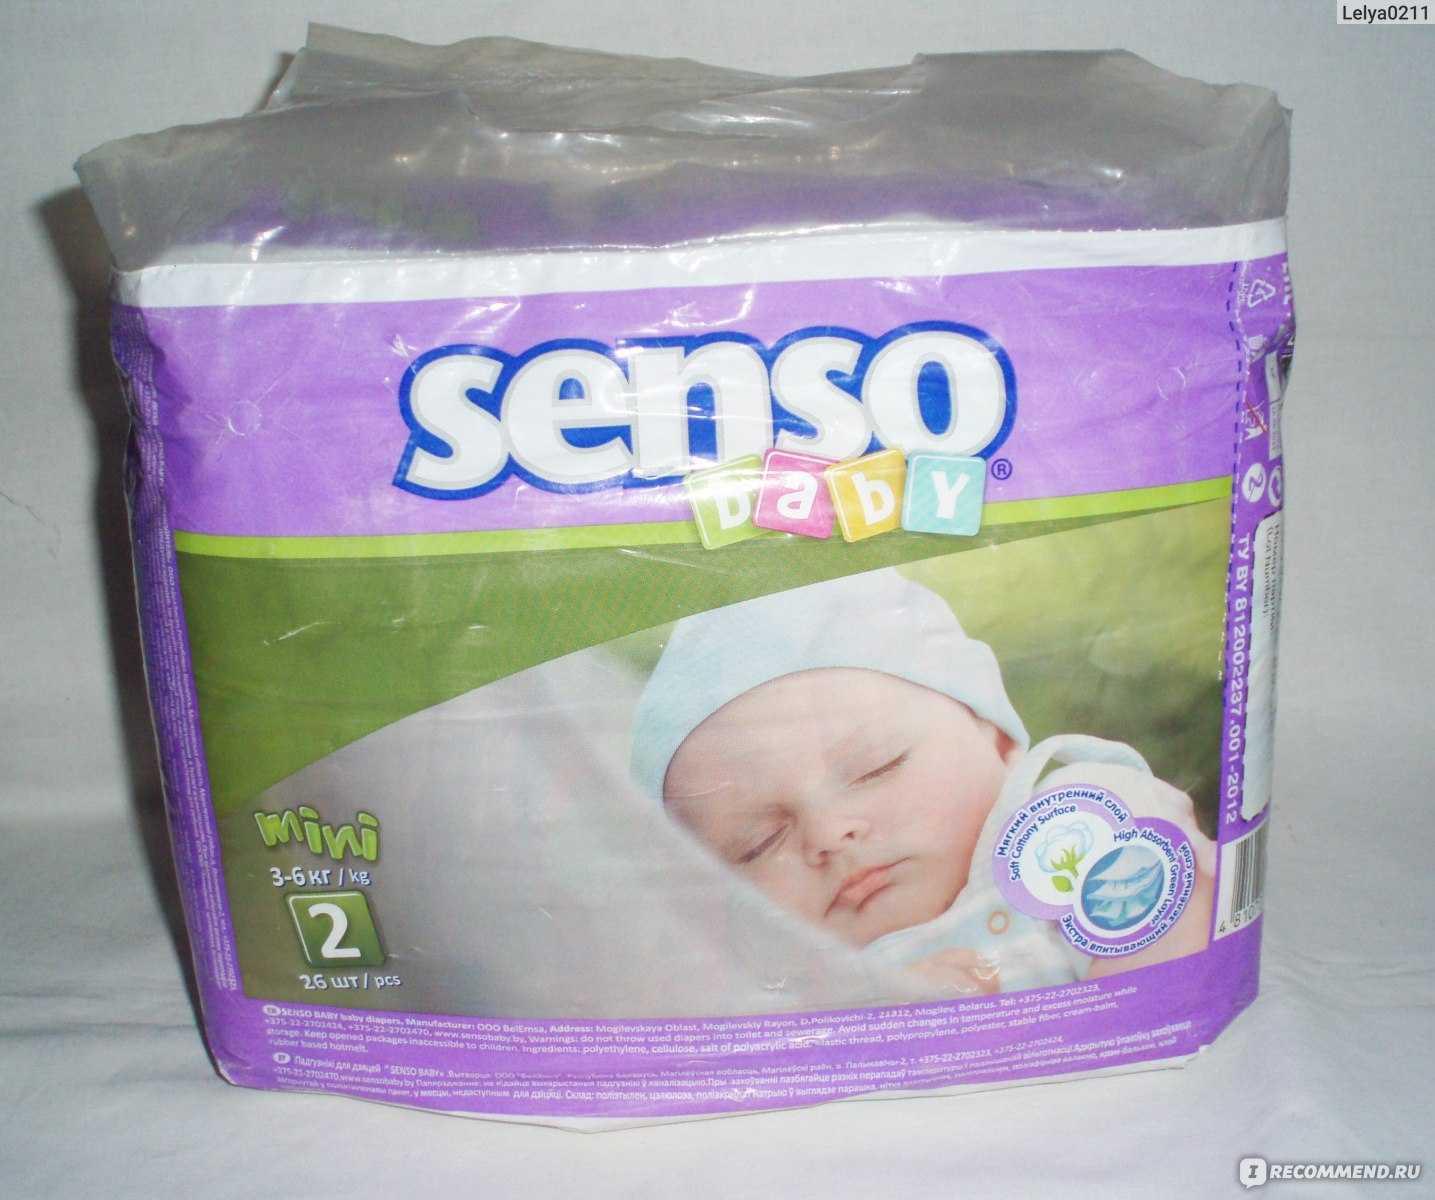 Характеристики подгузников senso baby